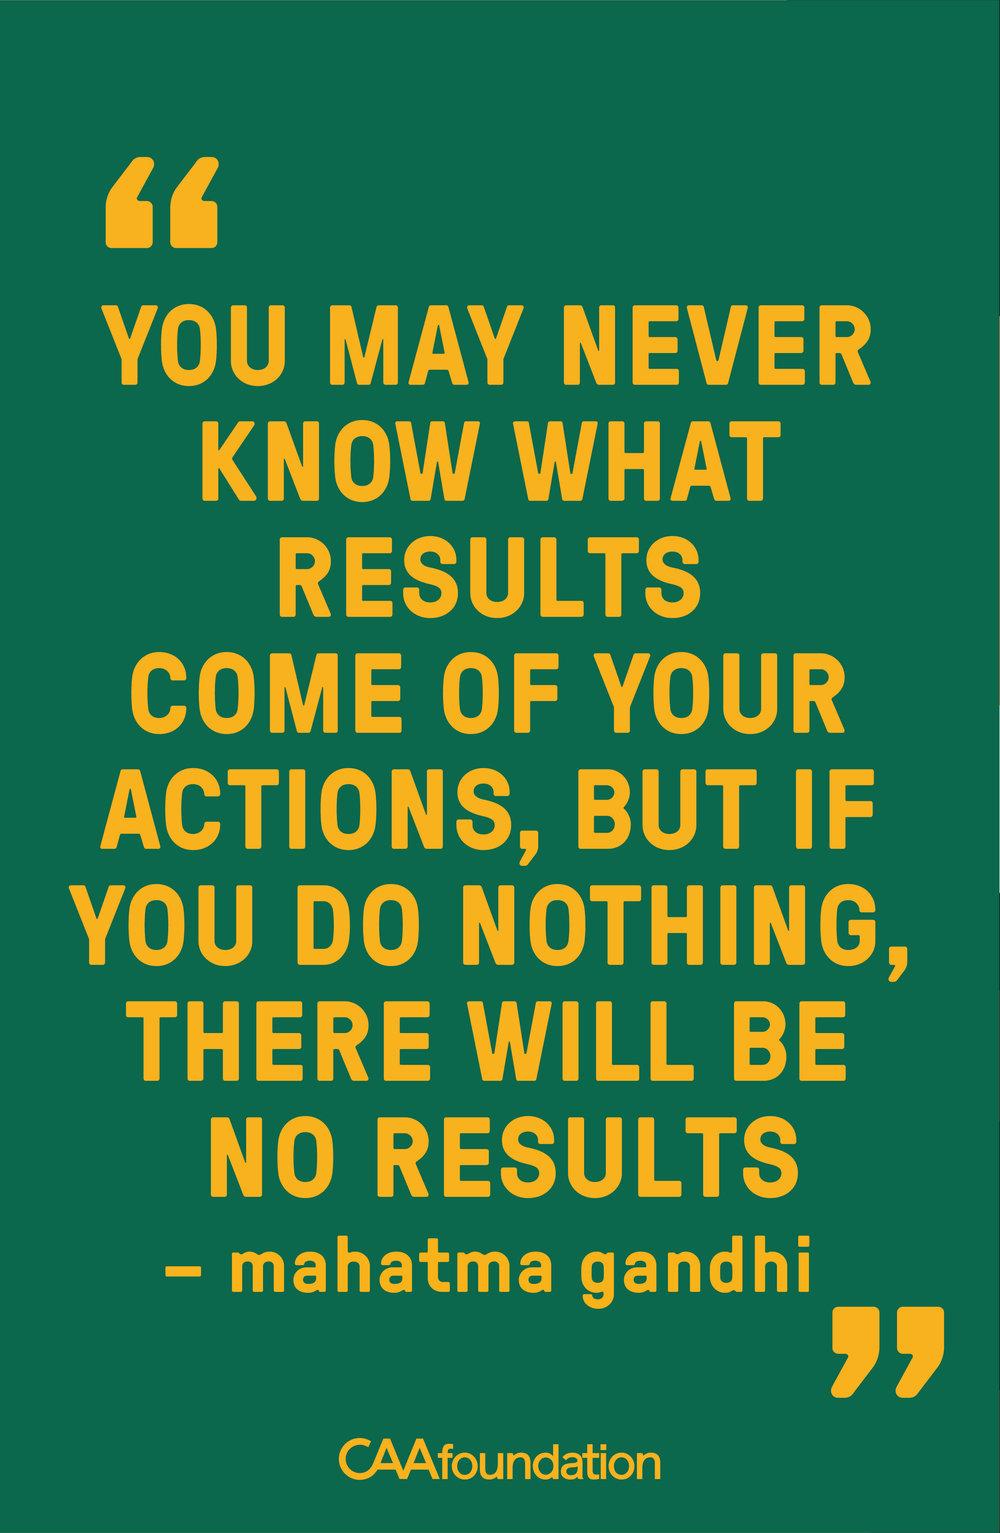 Take_Action_Posters_v5-23.jpg